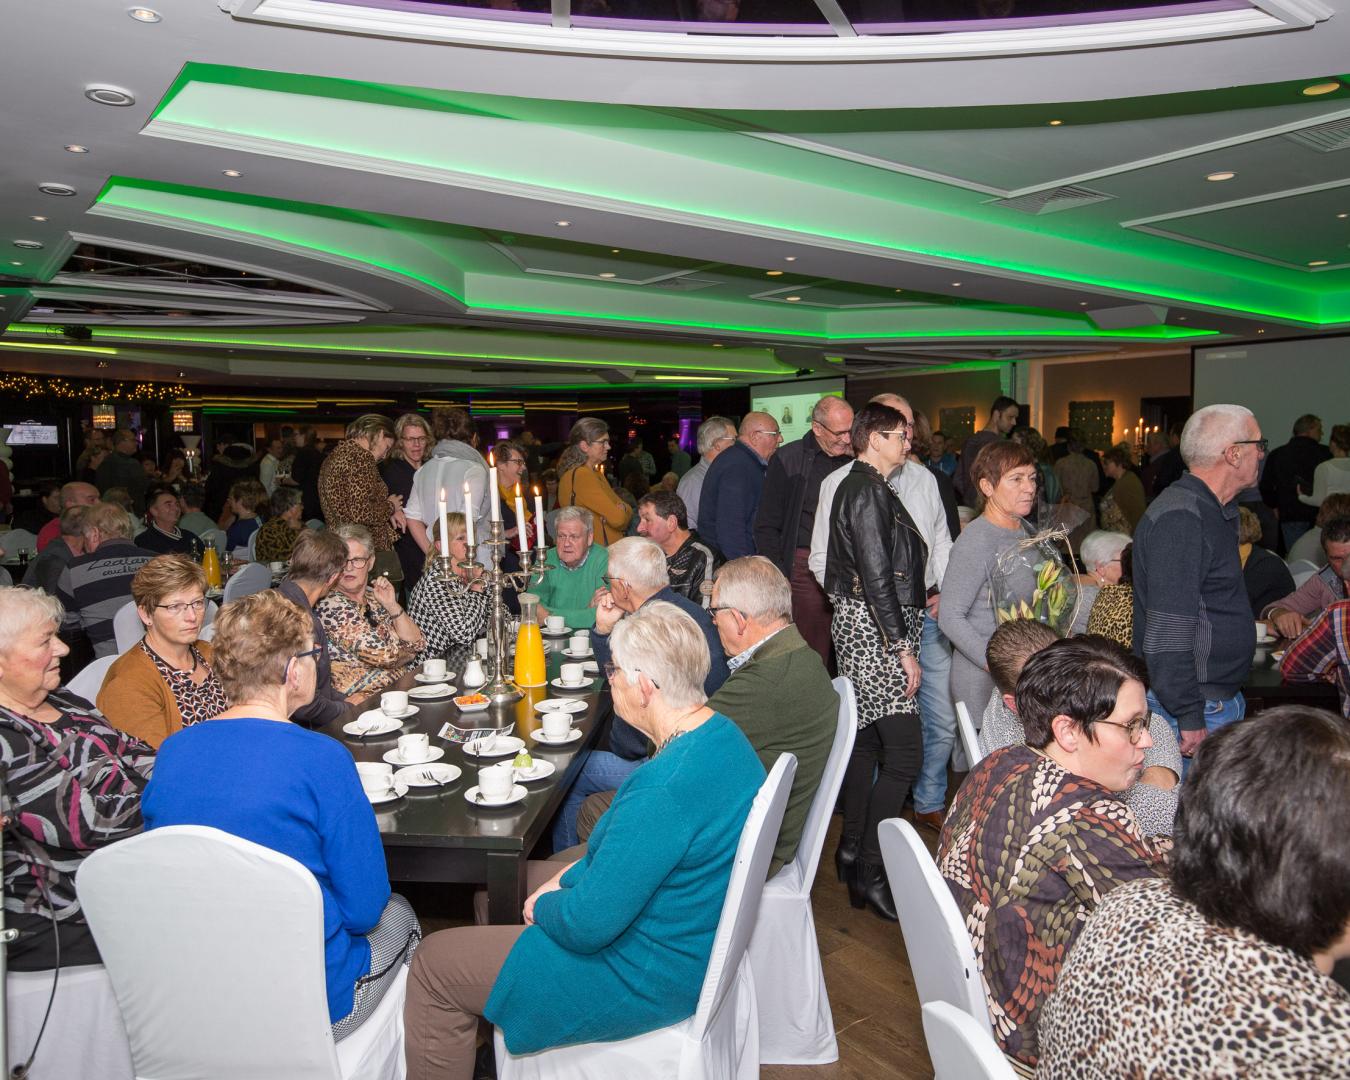 Feest voor gepensioneerde en jubilerende medewerkers Van Werven